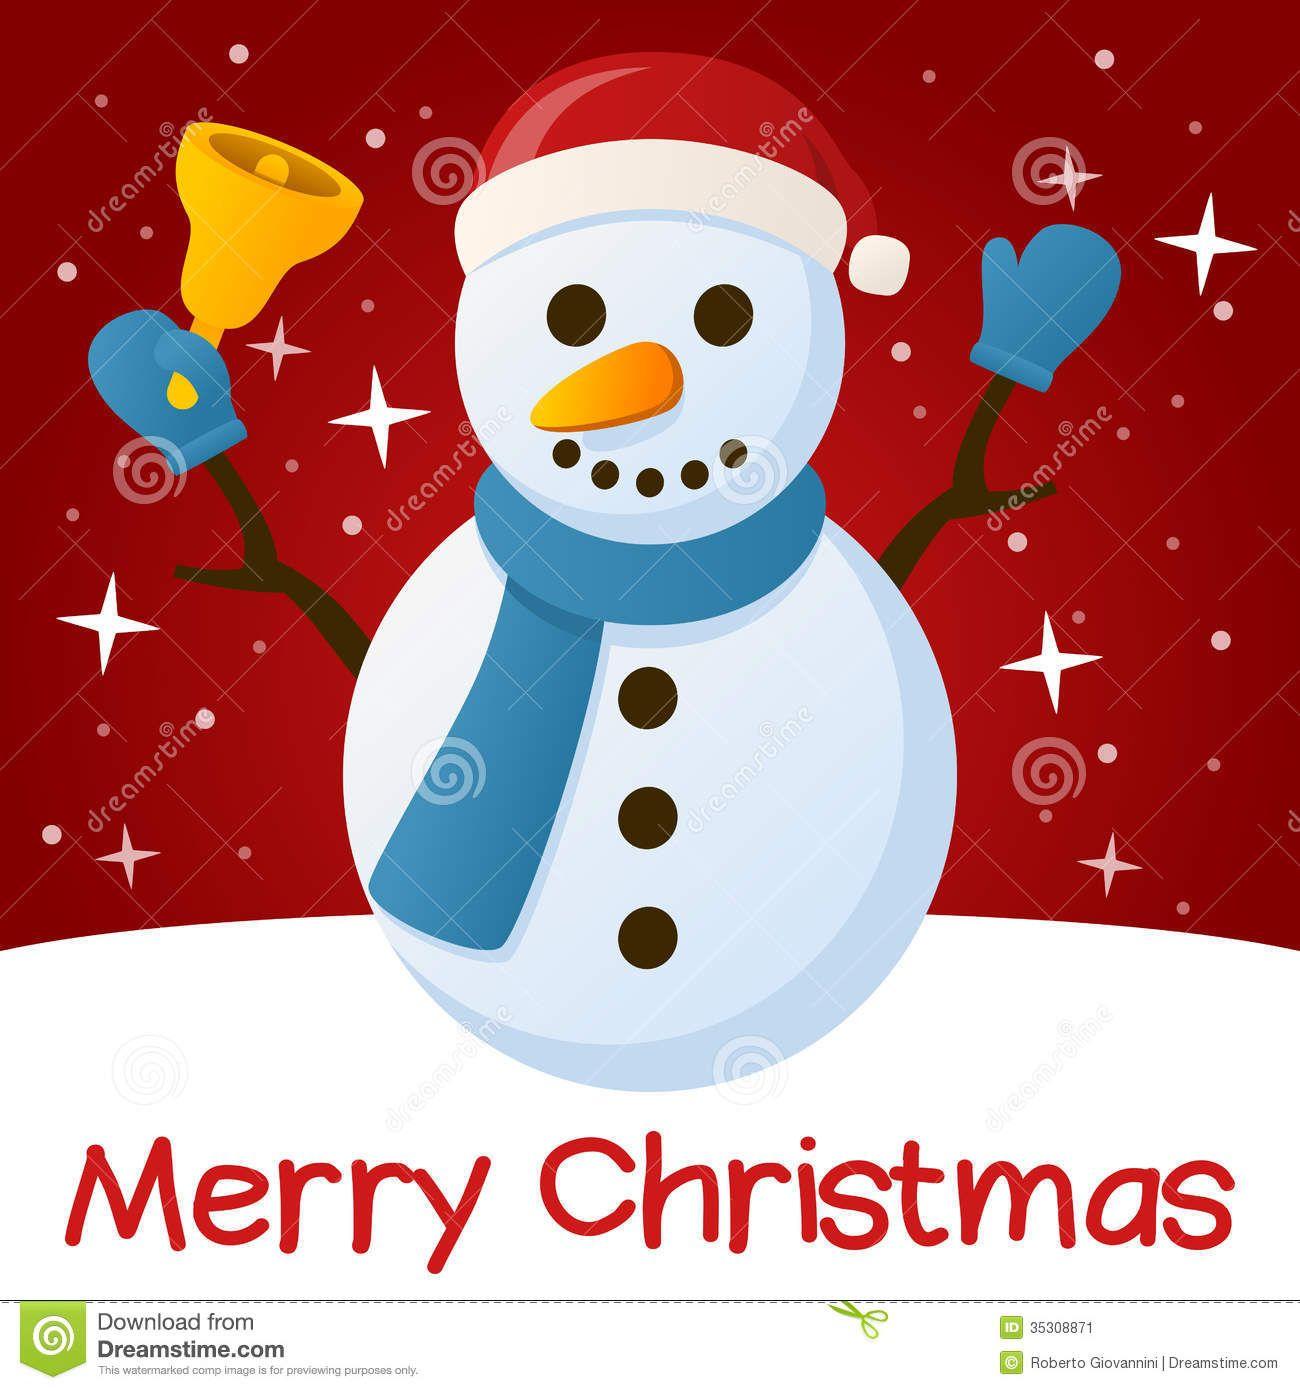 Download Red Christmas Card Snowman Cartoon Vector via